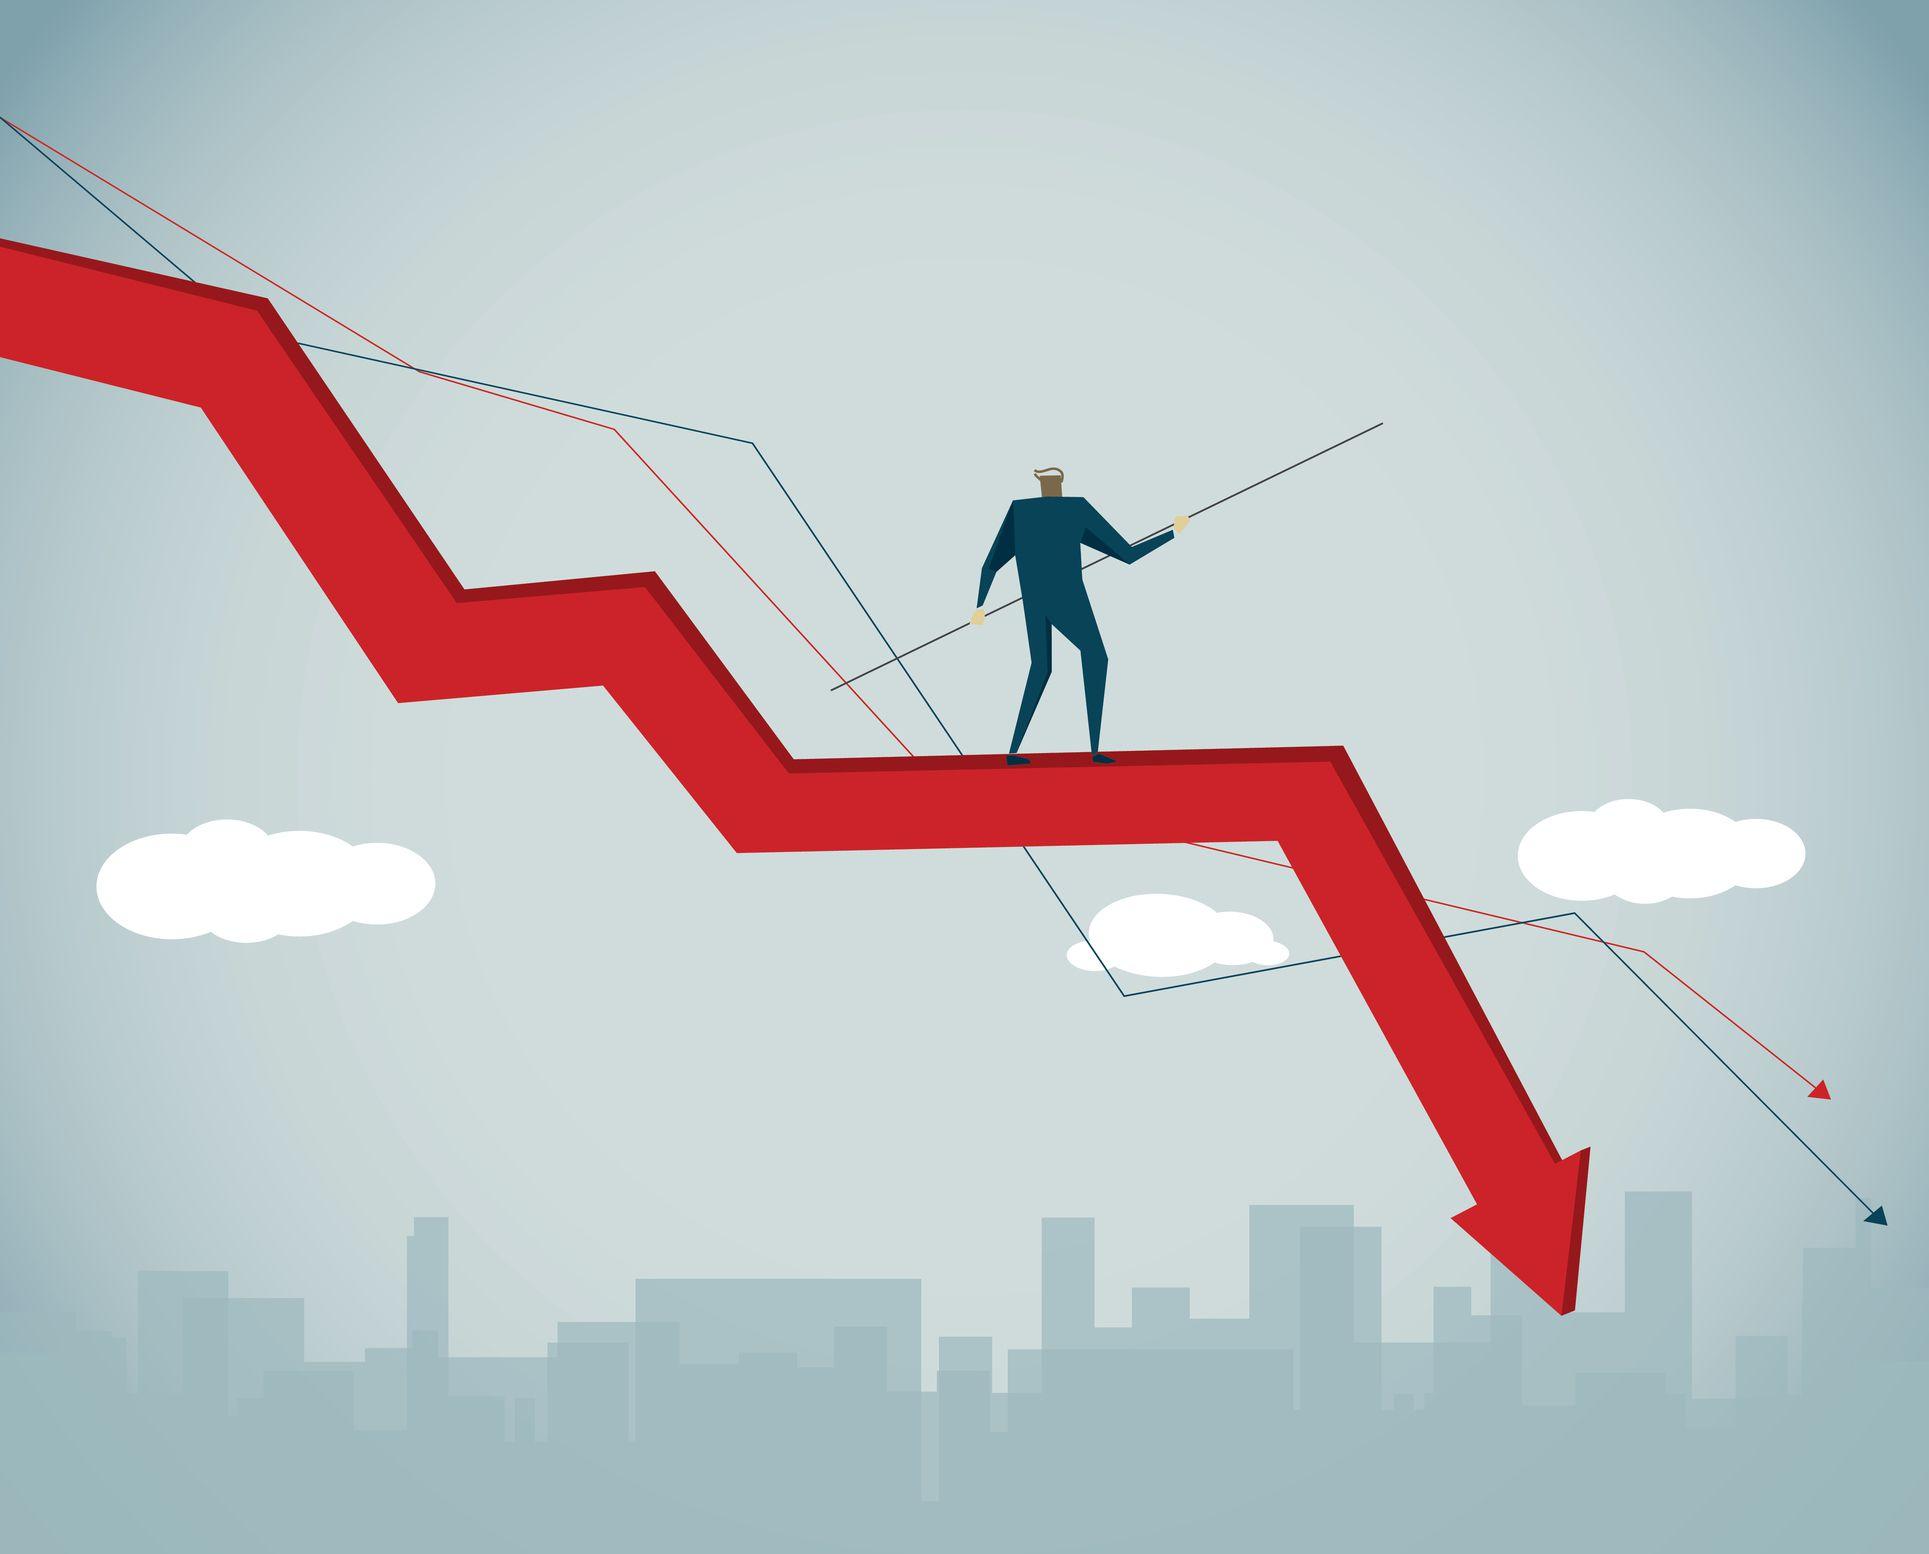 Risiko Tinggi Investasi Yang Harus Kamu Waspadai